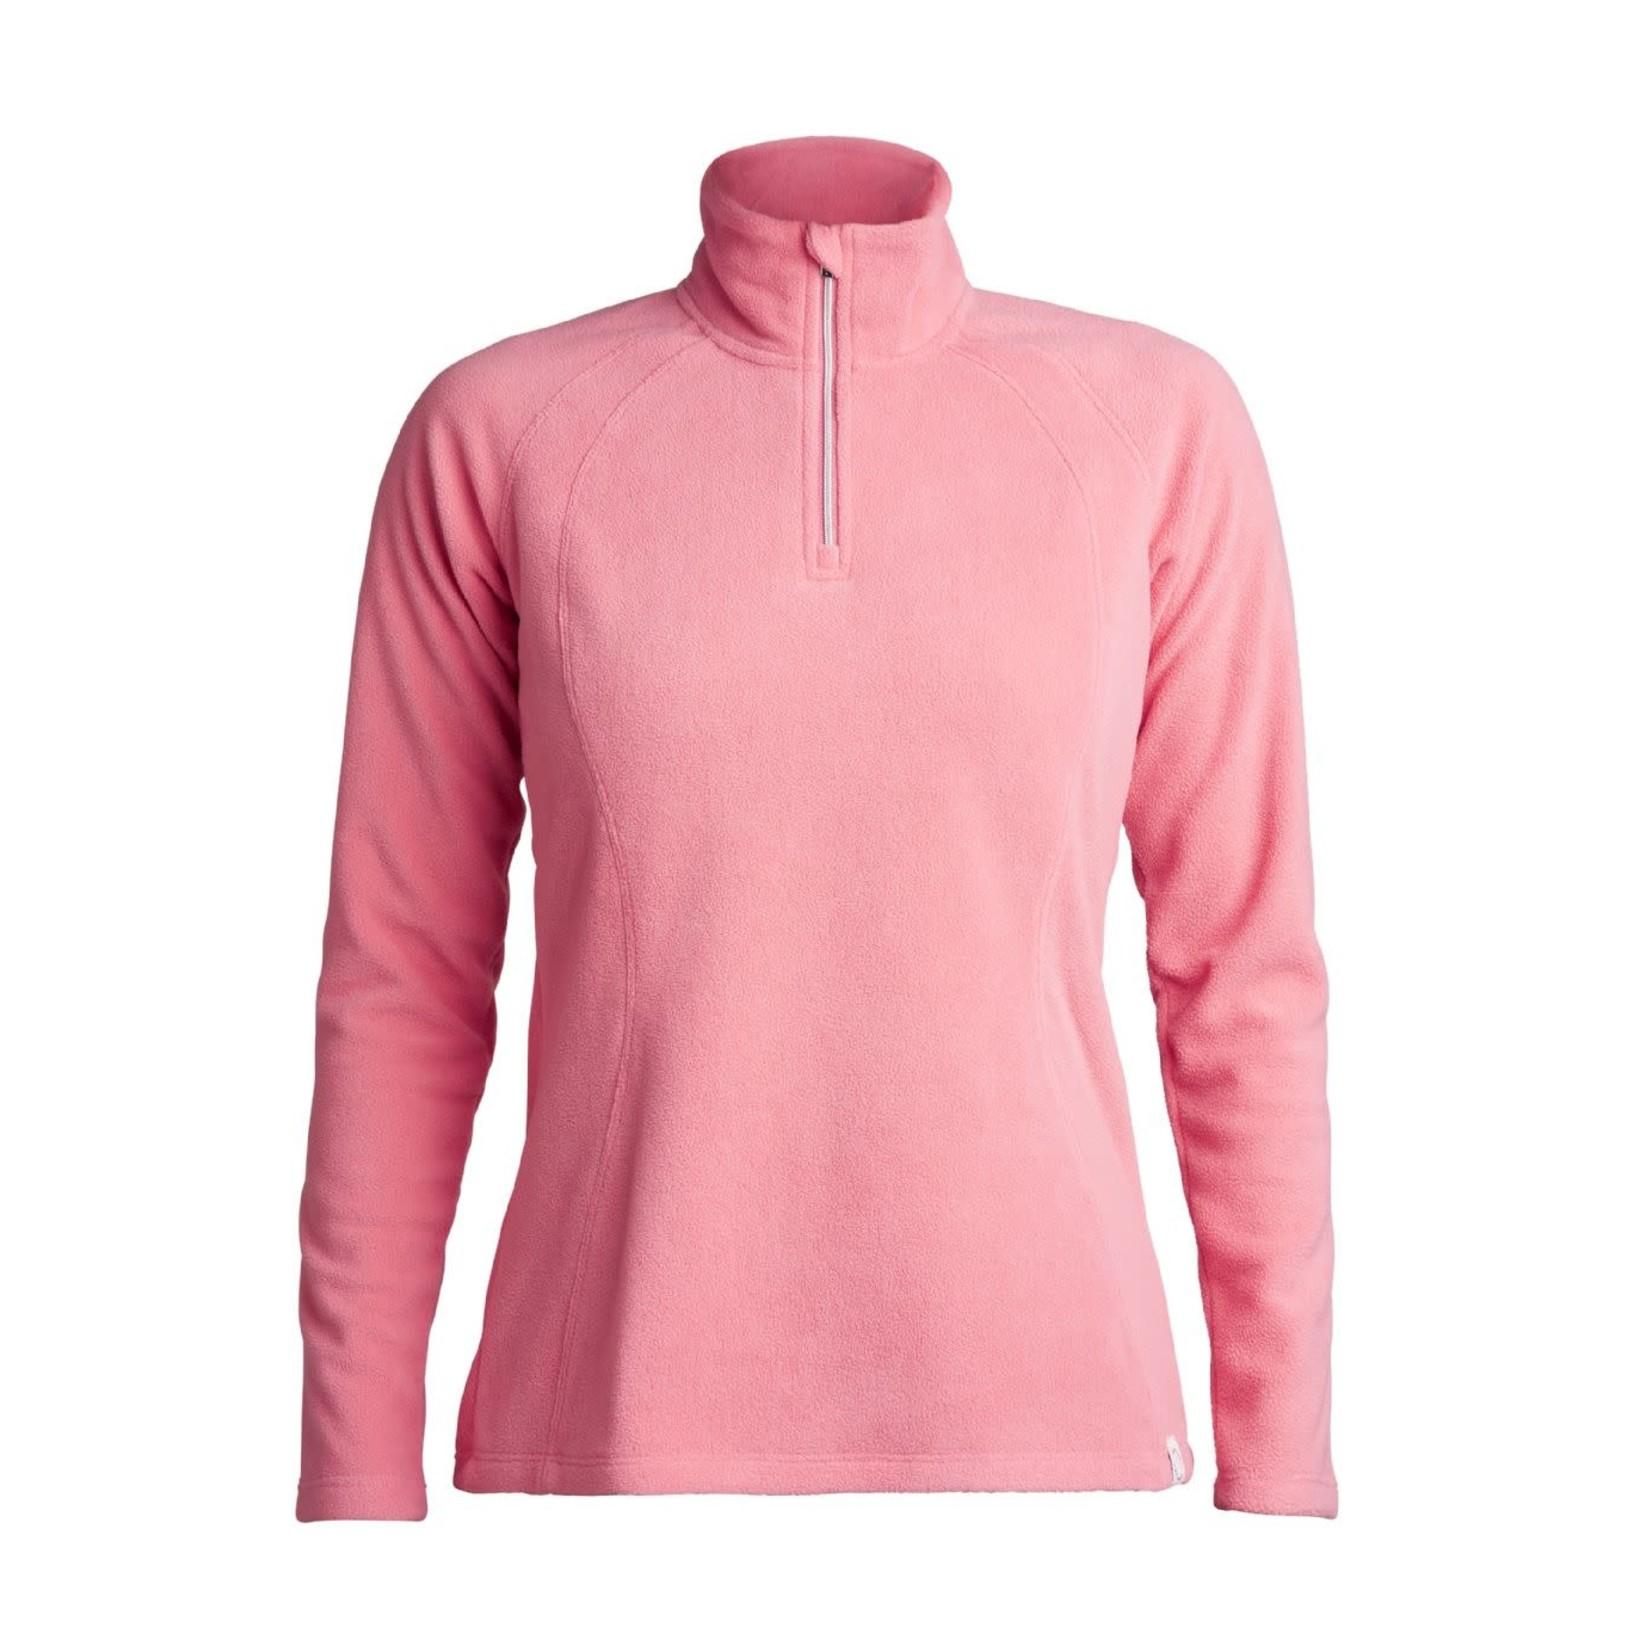 Rohnisch Rohnisch Amy Fleece Half Zip - Dolce Pink